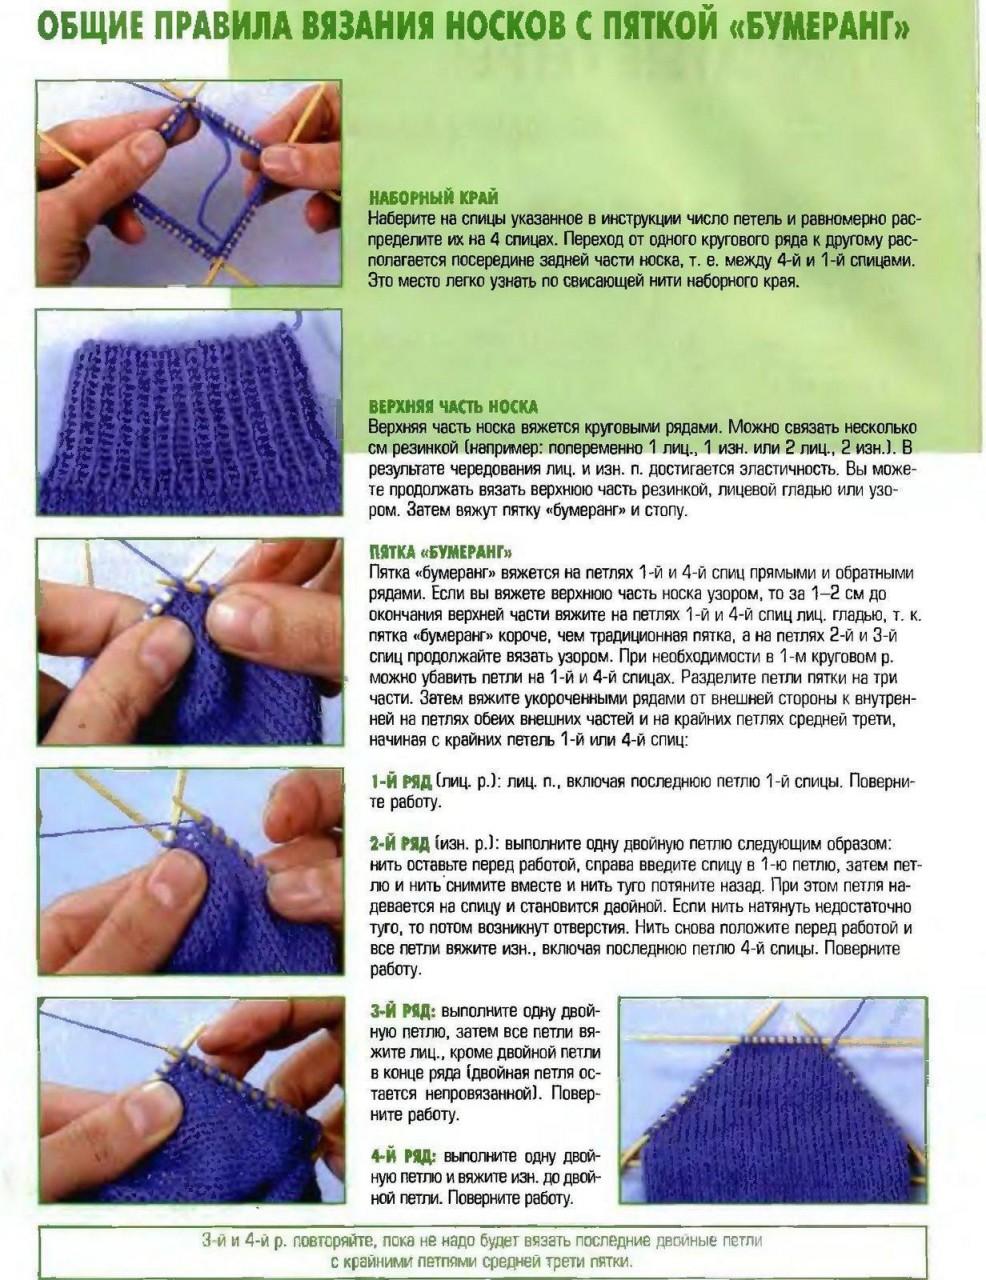 Вязание носков работа 23